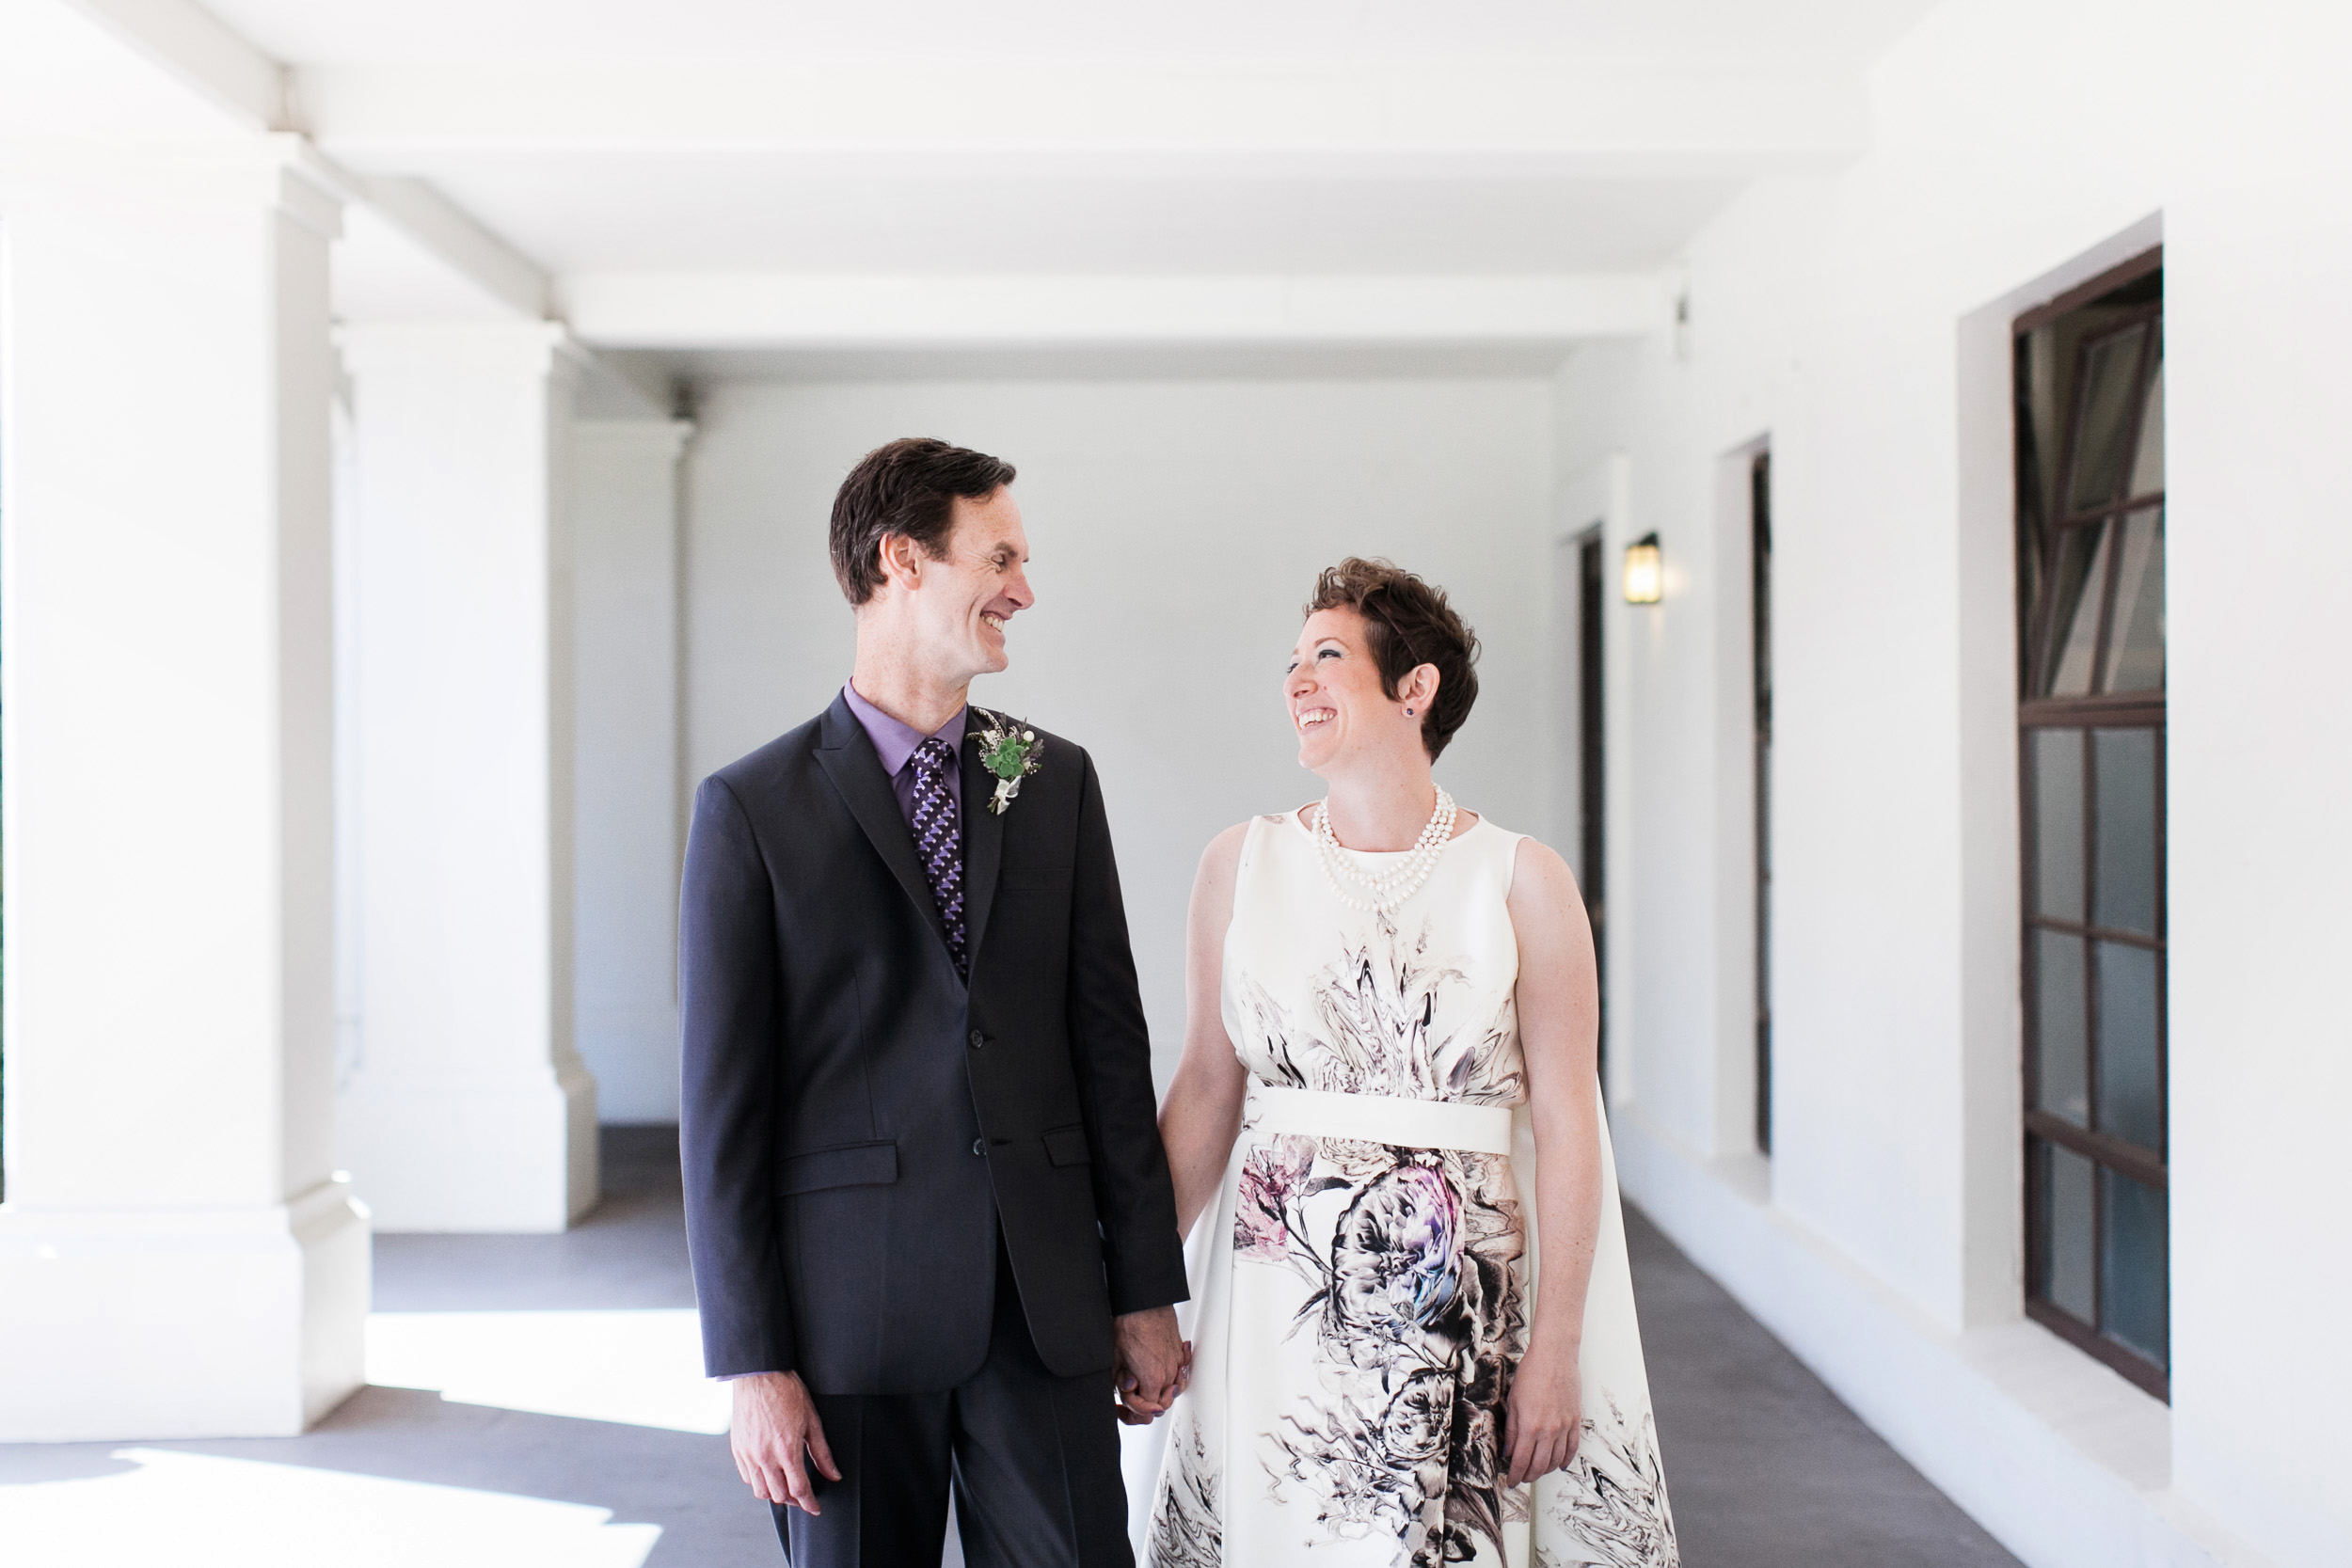 082716_A+M_Golden Gate Club Wedding_Buena Lane Photography_ER0286 copy.jpg